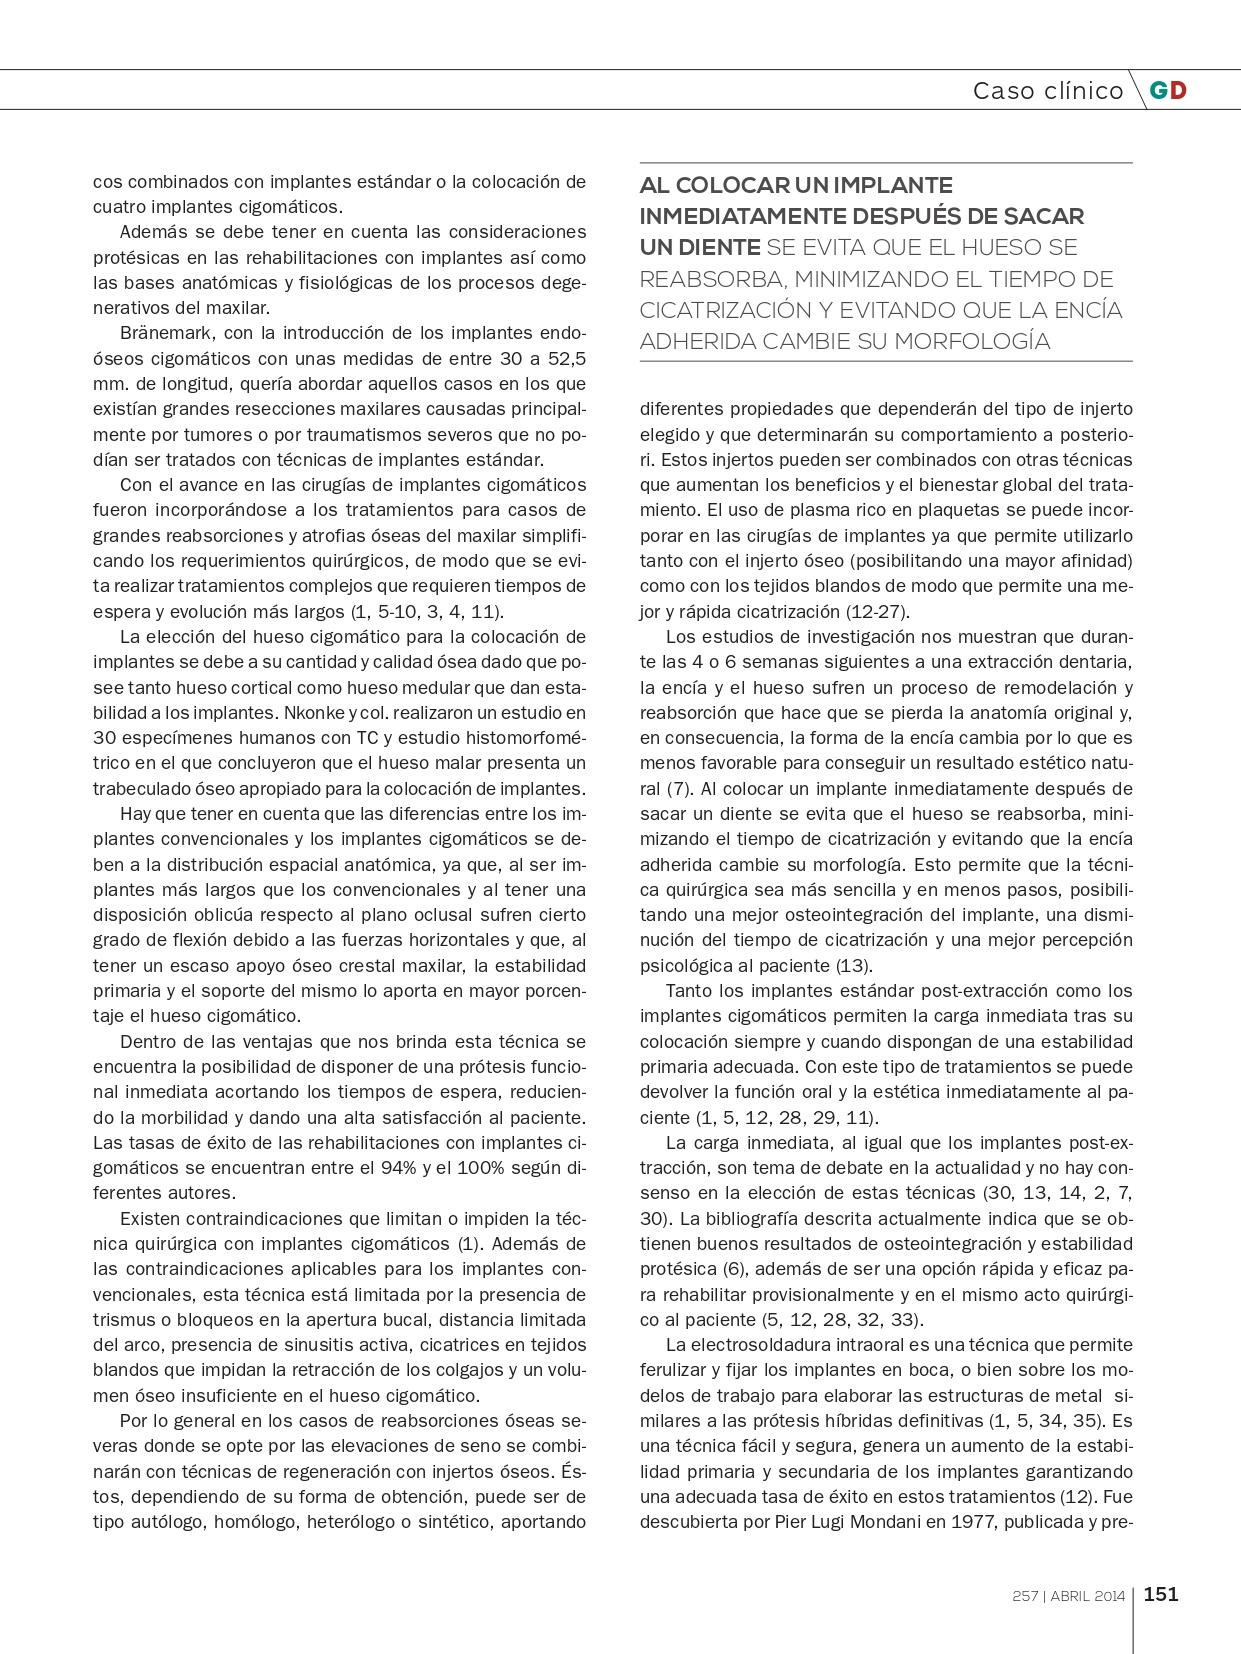 Rehabilitación-del-Maxilar-superior-con-implantes-Cigomáticos_page-0002